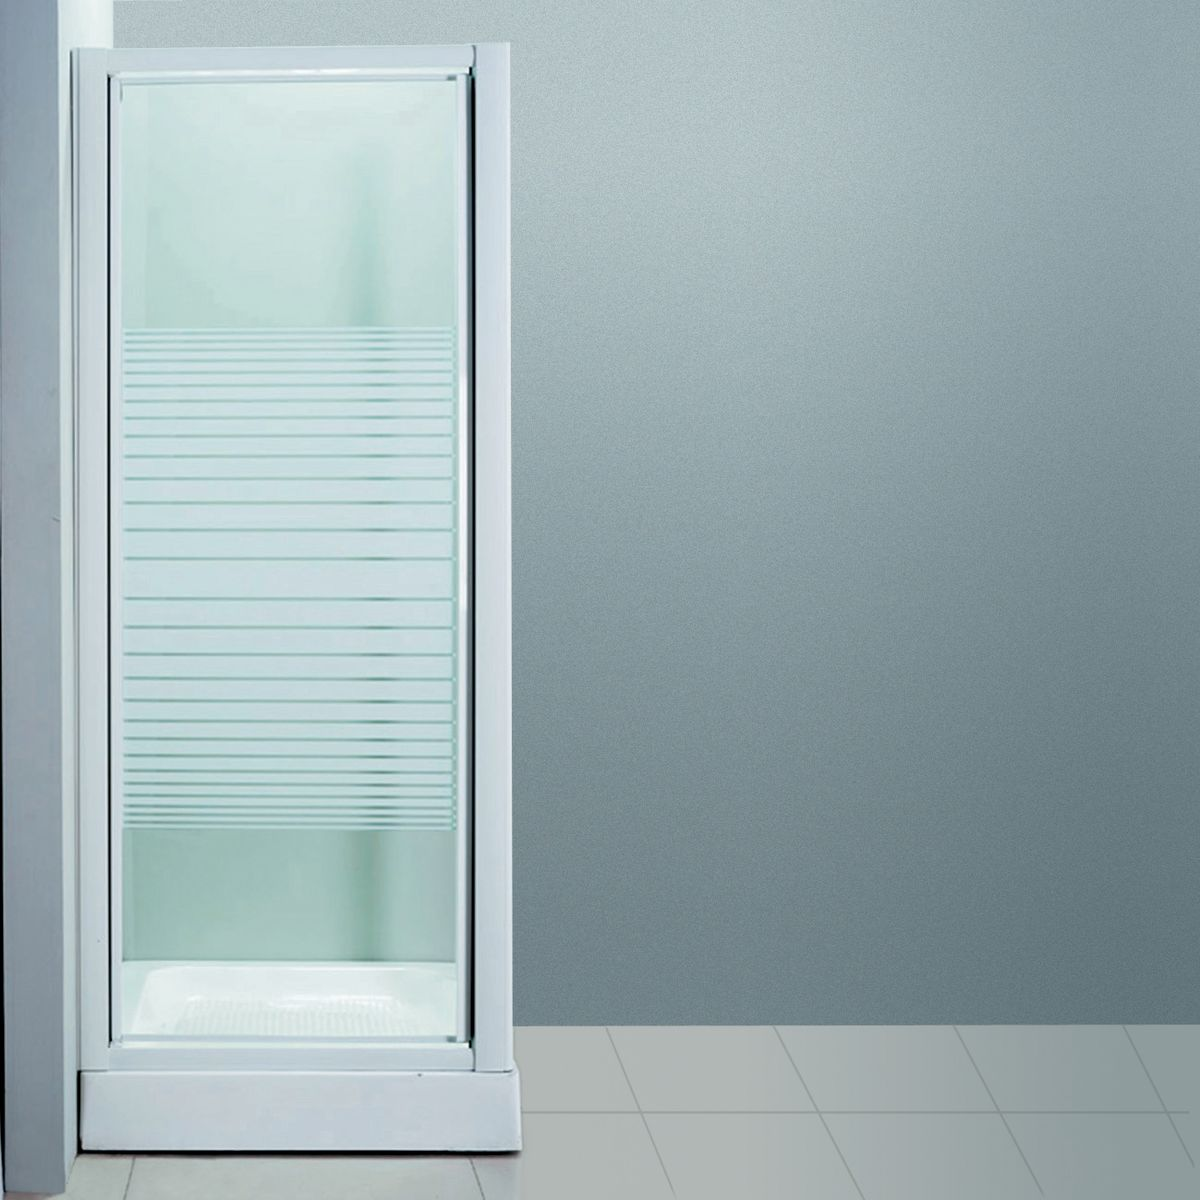 cabine armadio leroy merlin prezzi: box doccia e pareti doccia ... - Armadio A Muro Leroy Merlin